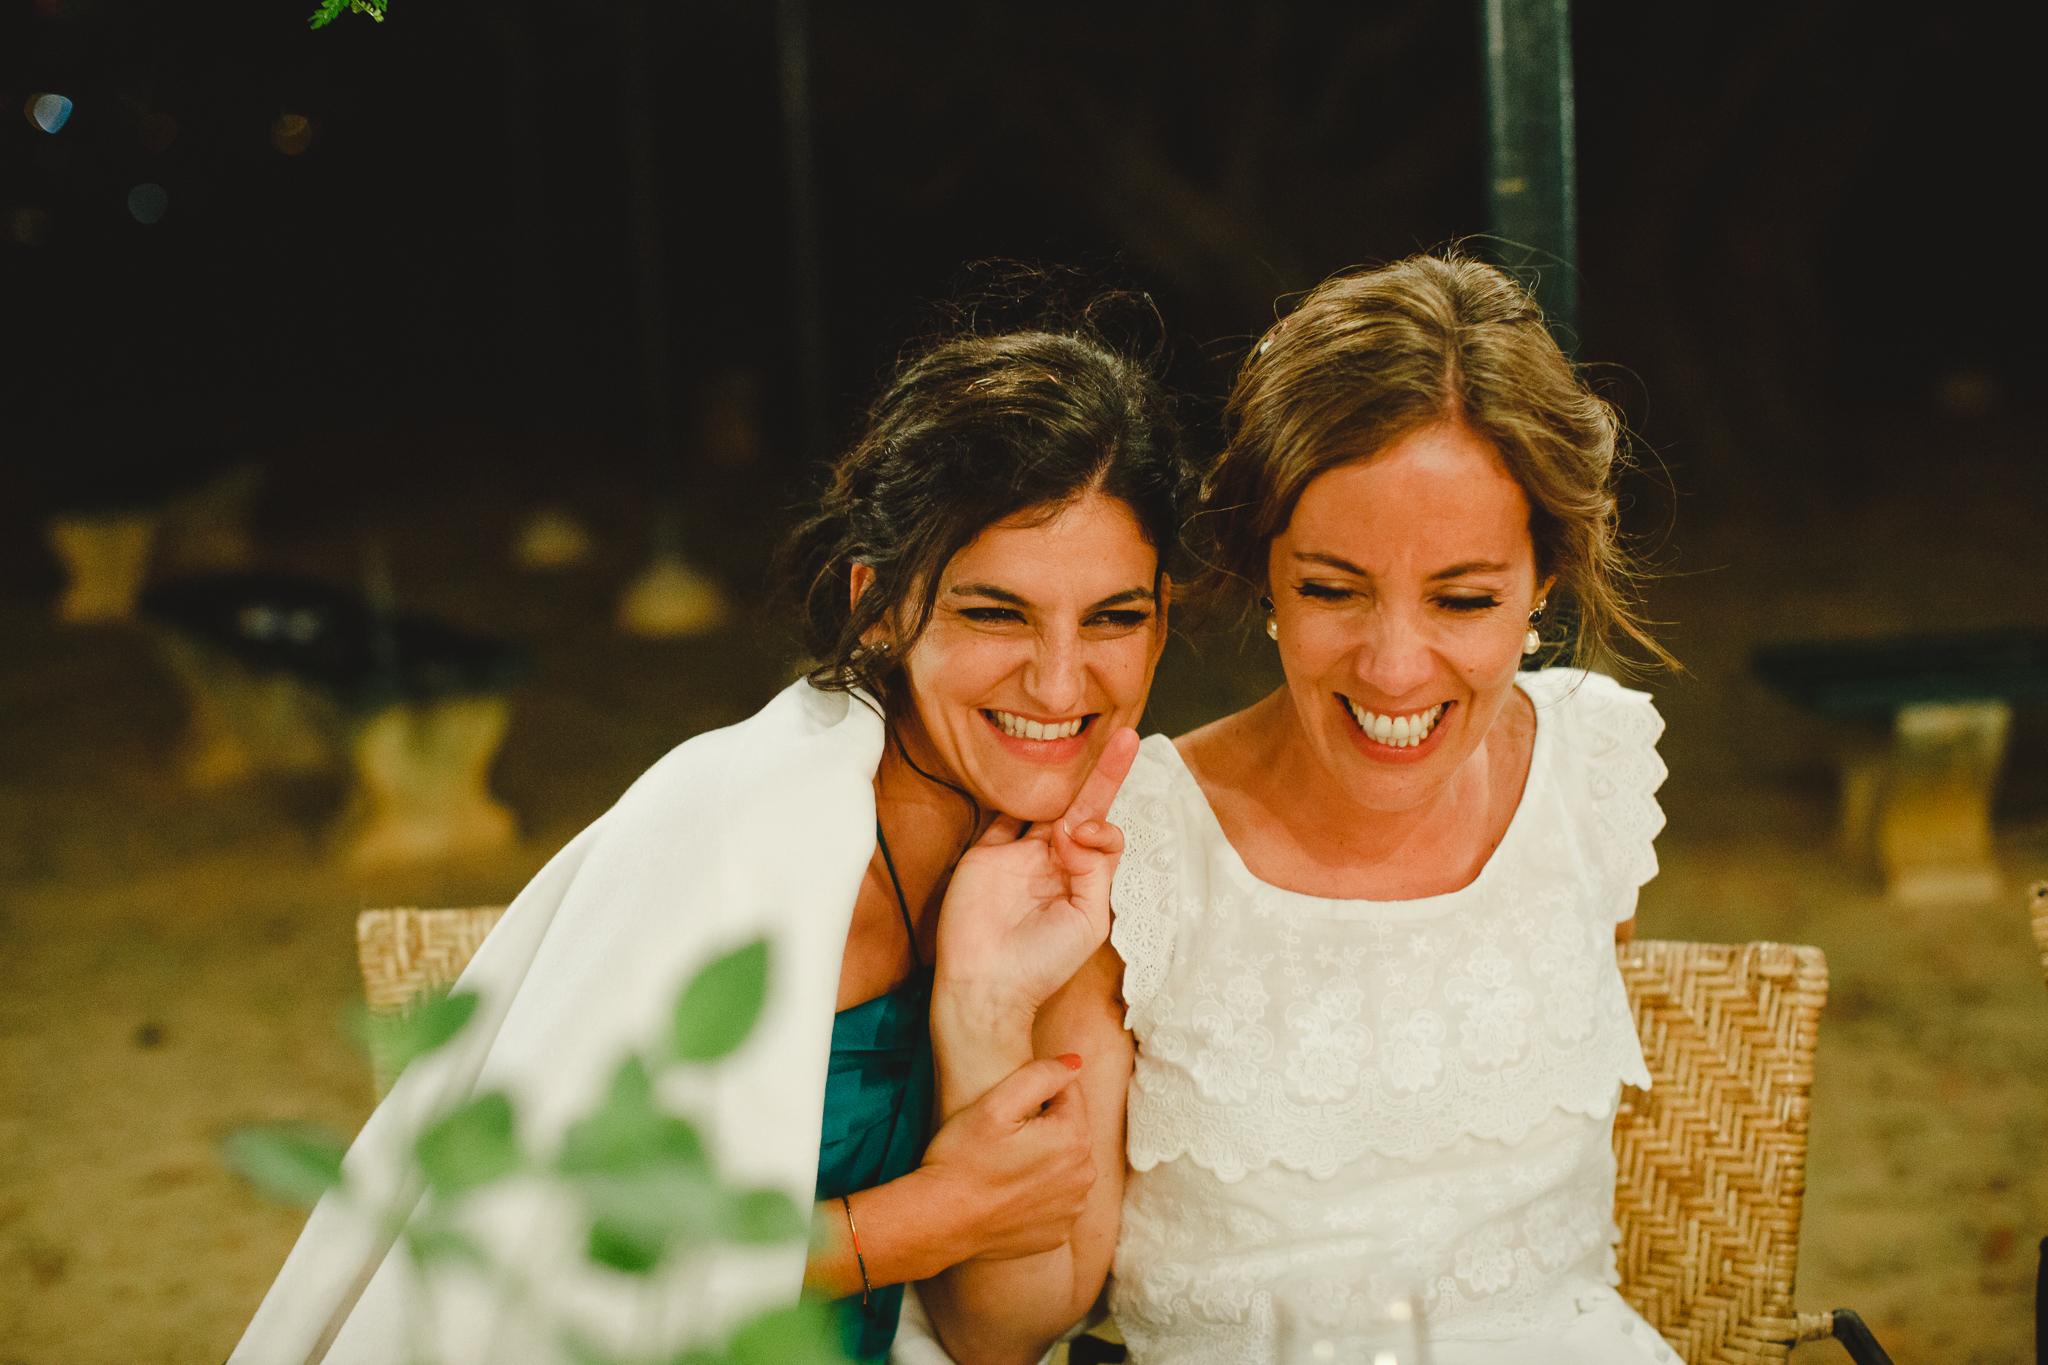 Wedding Photography Lisbon, Wedding Photographer in Portugal, Fotografia de Casamento Lisboa, Fotografia Casamento Estufa Real por Hello Twiggs